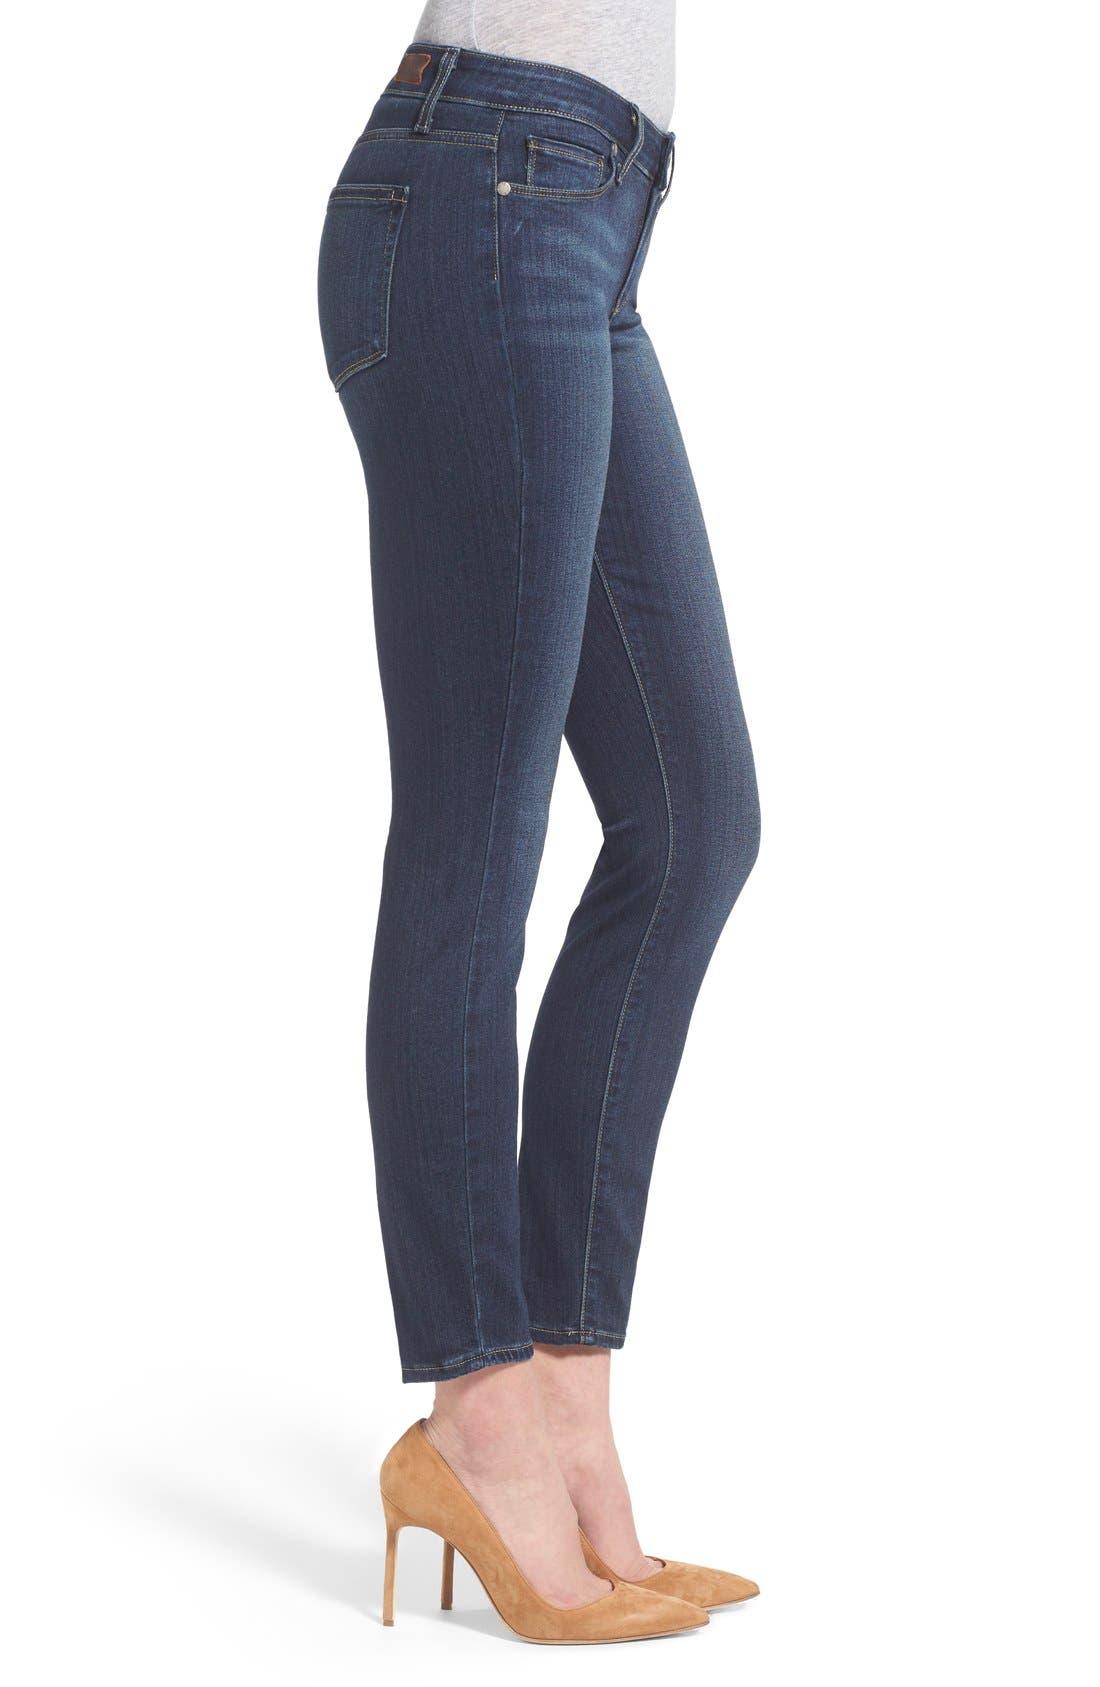 Alternate Image 3  - Paige Denim 'Transcend - Verdugo' Ankle Ultra Skinny Jeans (Nottingham) (Petite)